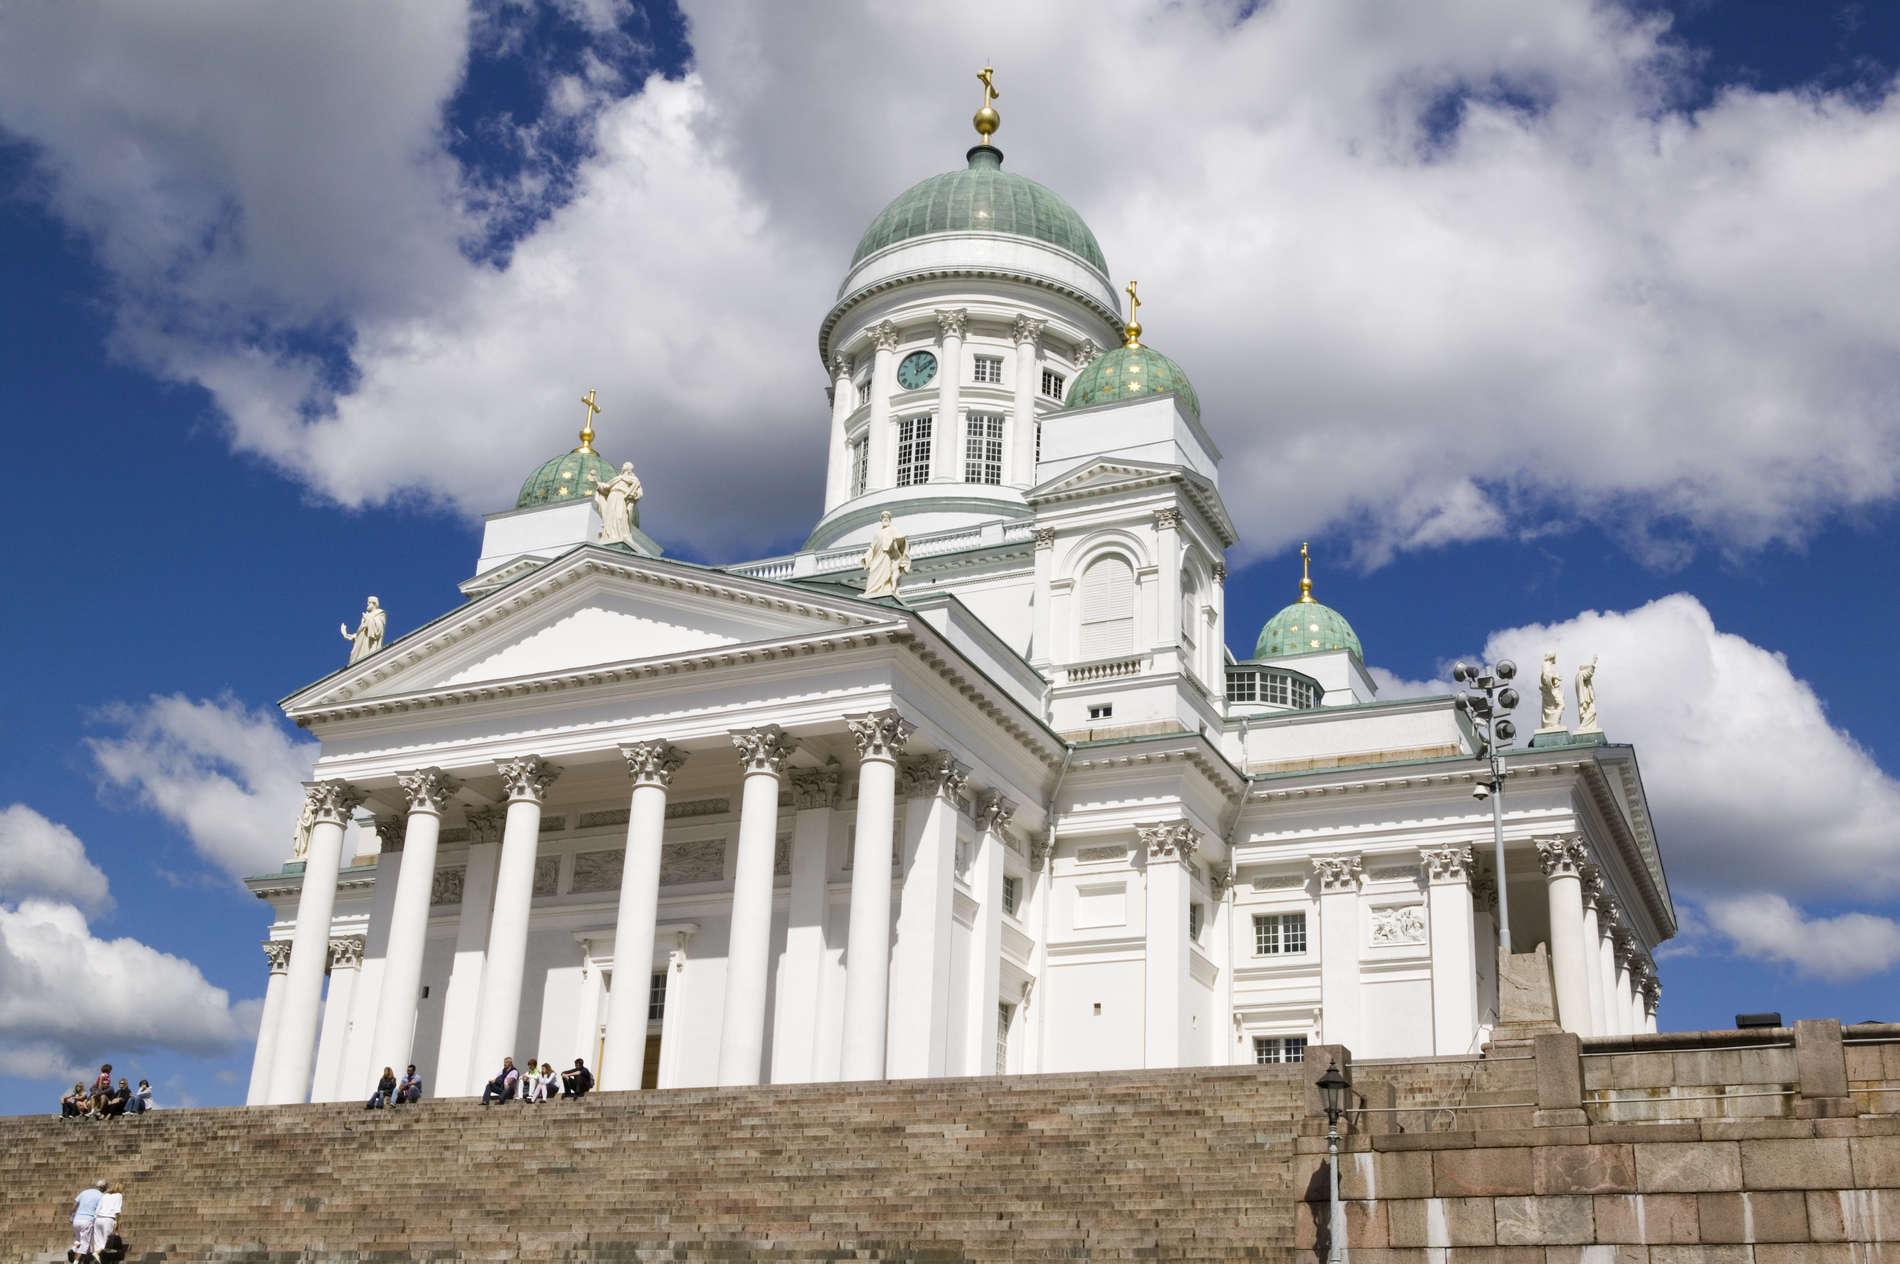 Photo by: Helsinki Marketing